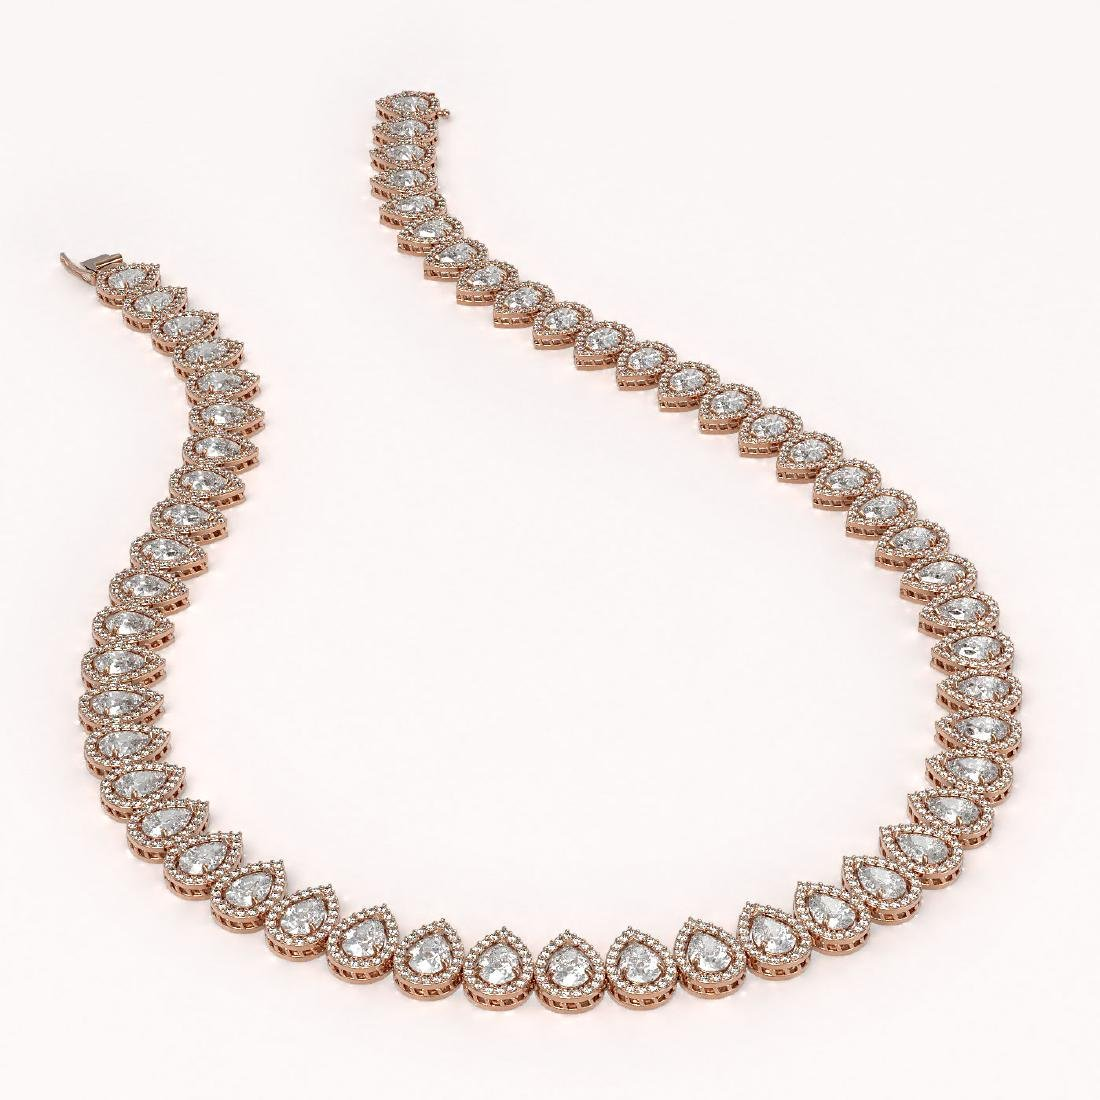 34.83 CTW Pear Diamond Designer Necklace 18K Rose Gold - 2